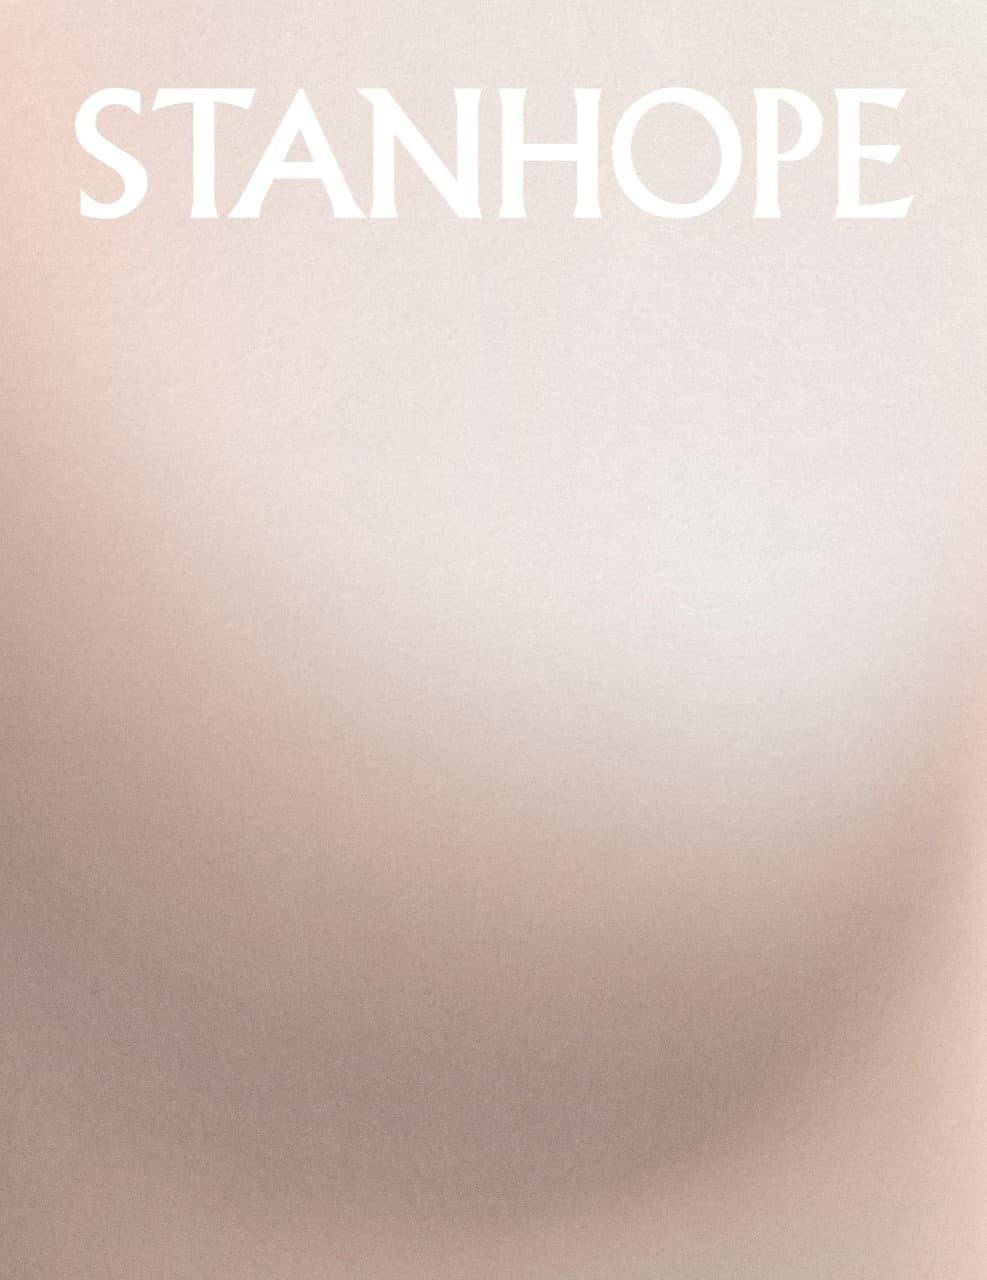 Stanhope Property Development, Graphic